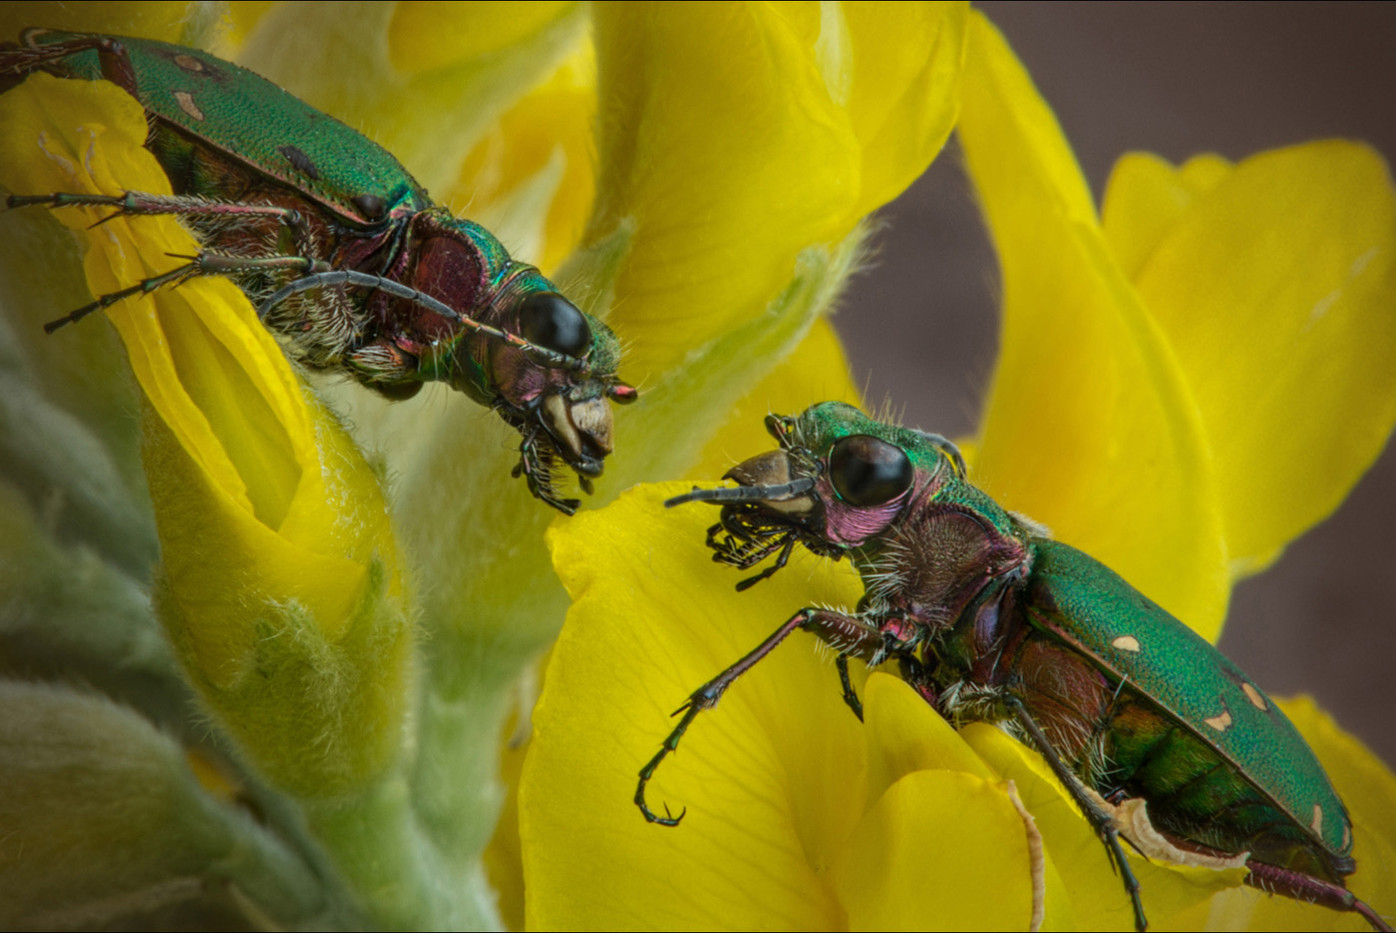 GROUP 1 16 TIGER BEETLES, CICINDELA CAMPESTRIS, MEET by Alan Cork